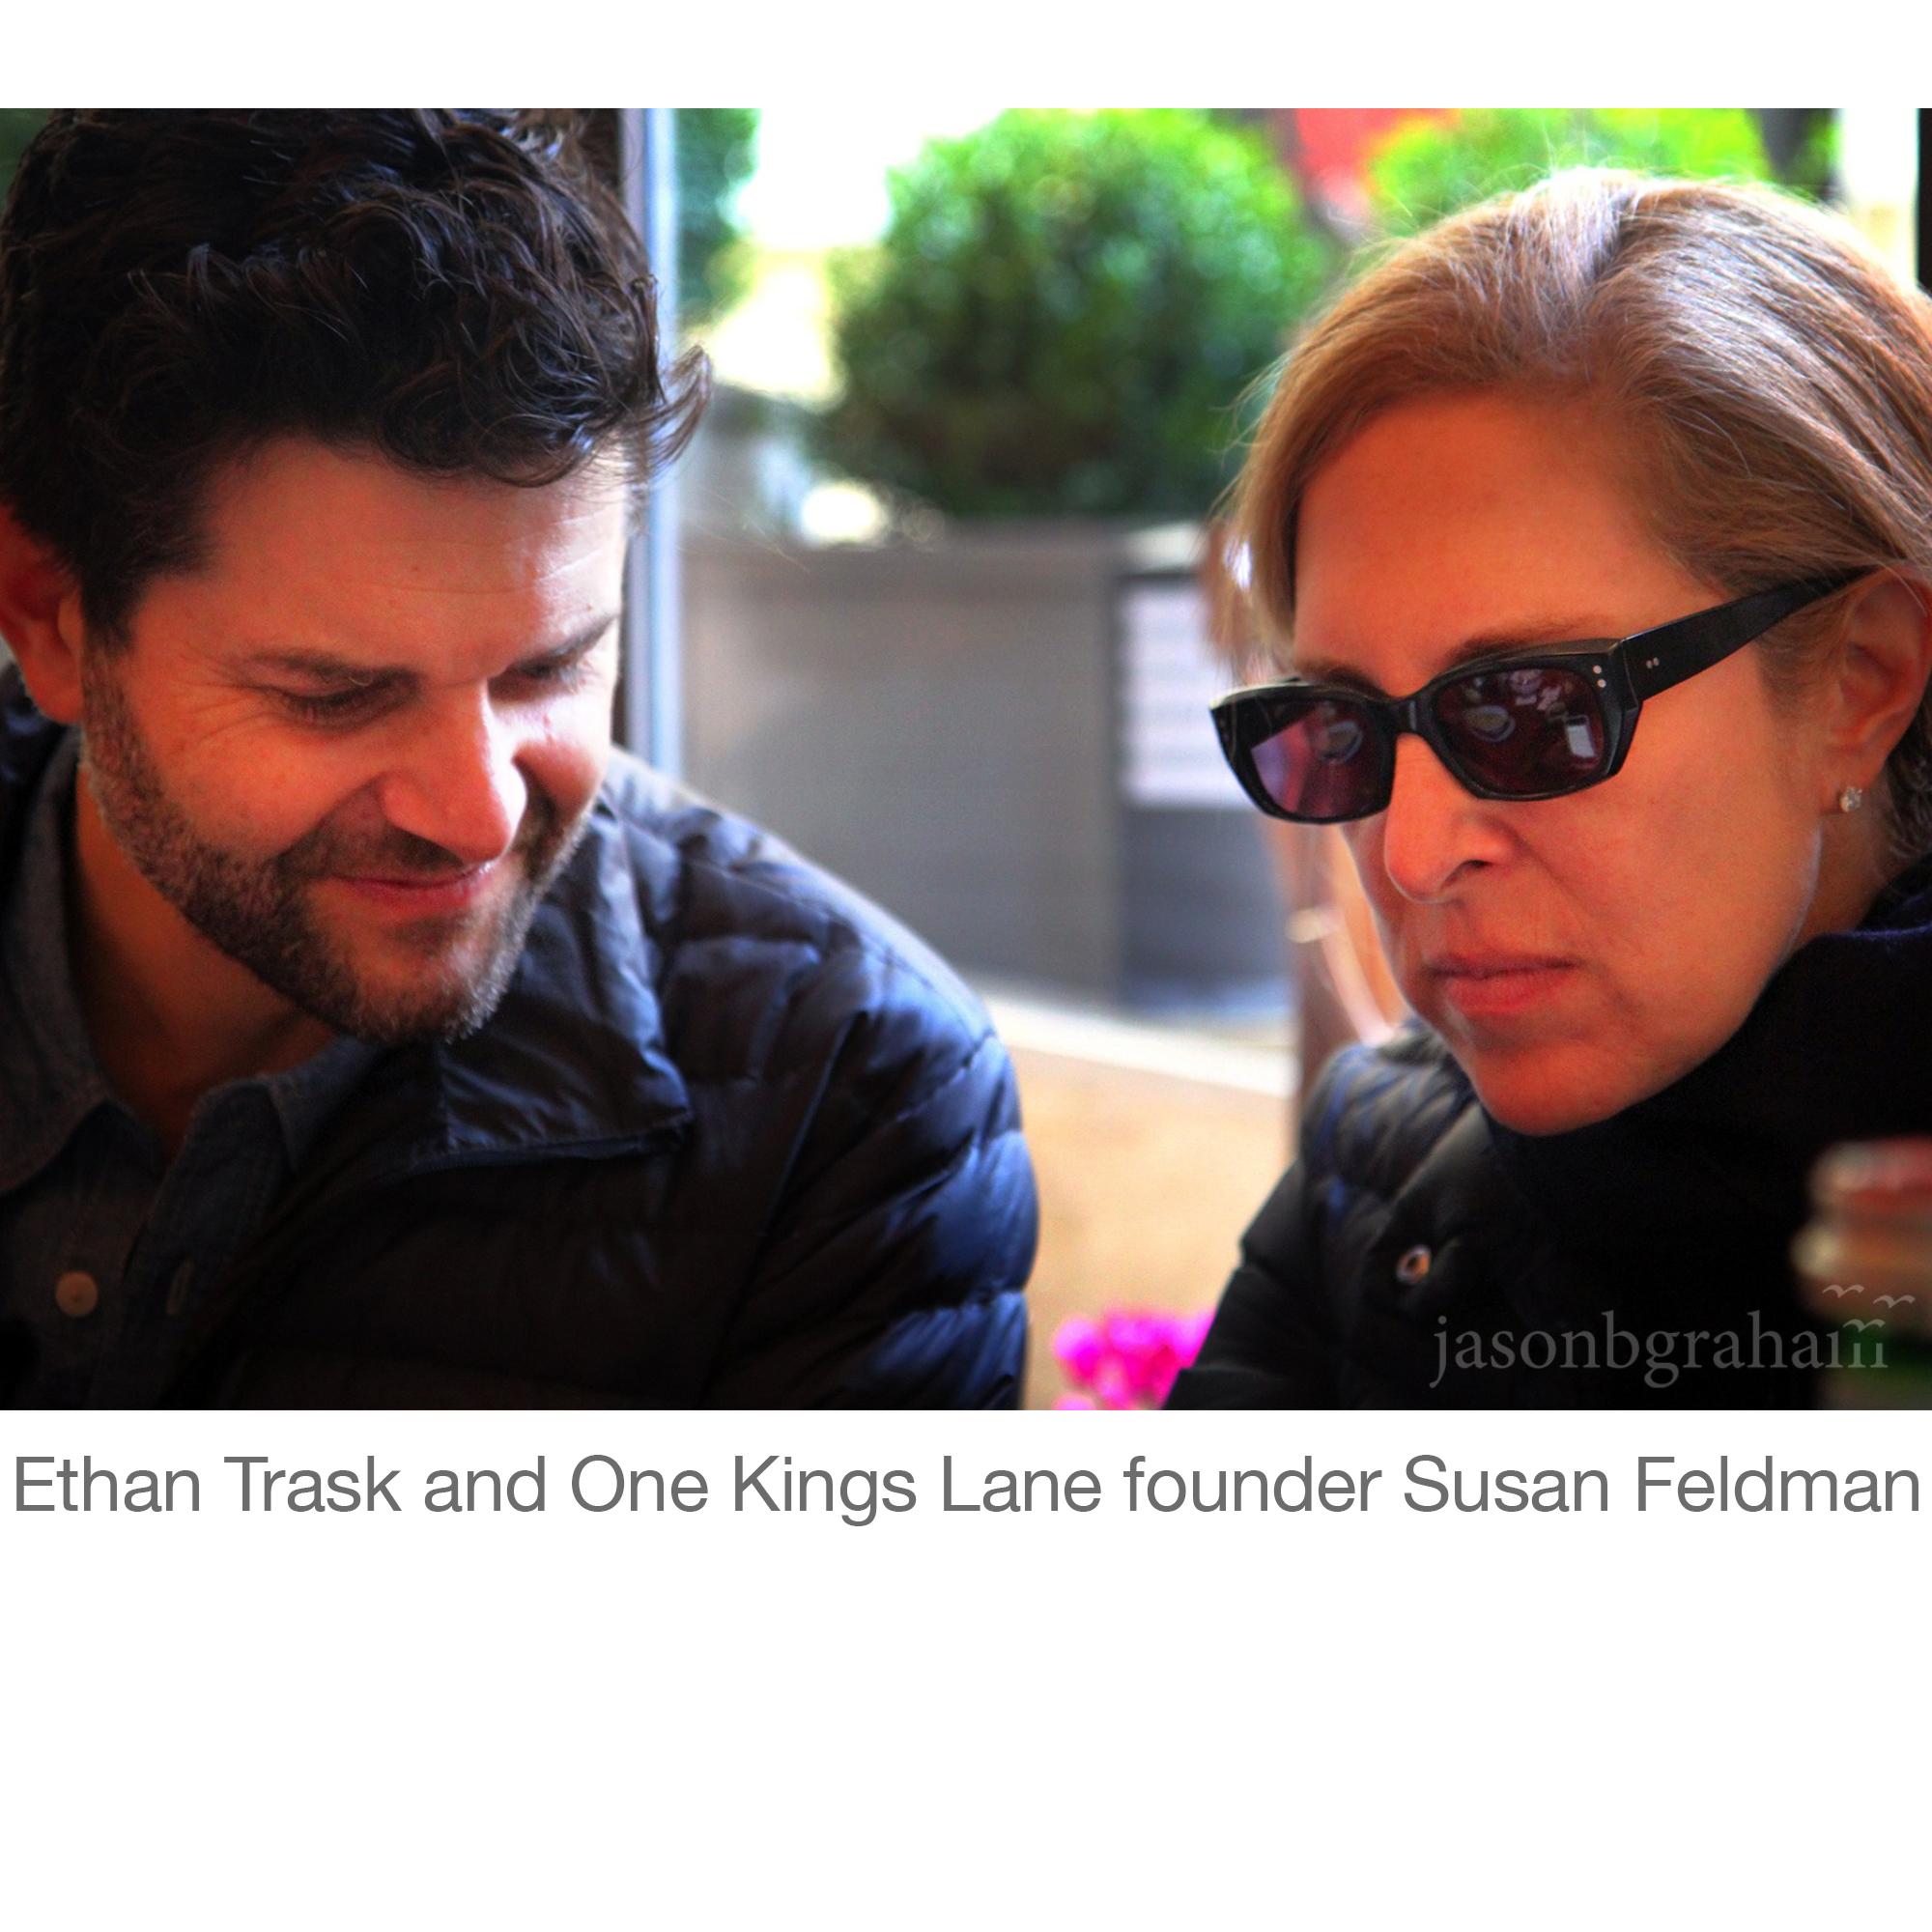 jason-b-graham-collaborations-one-kings-lane-shops-istanbul-susan-feldman-ethan-trask-square